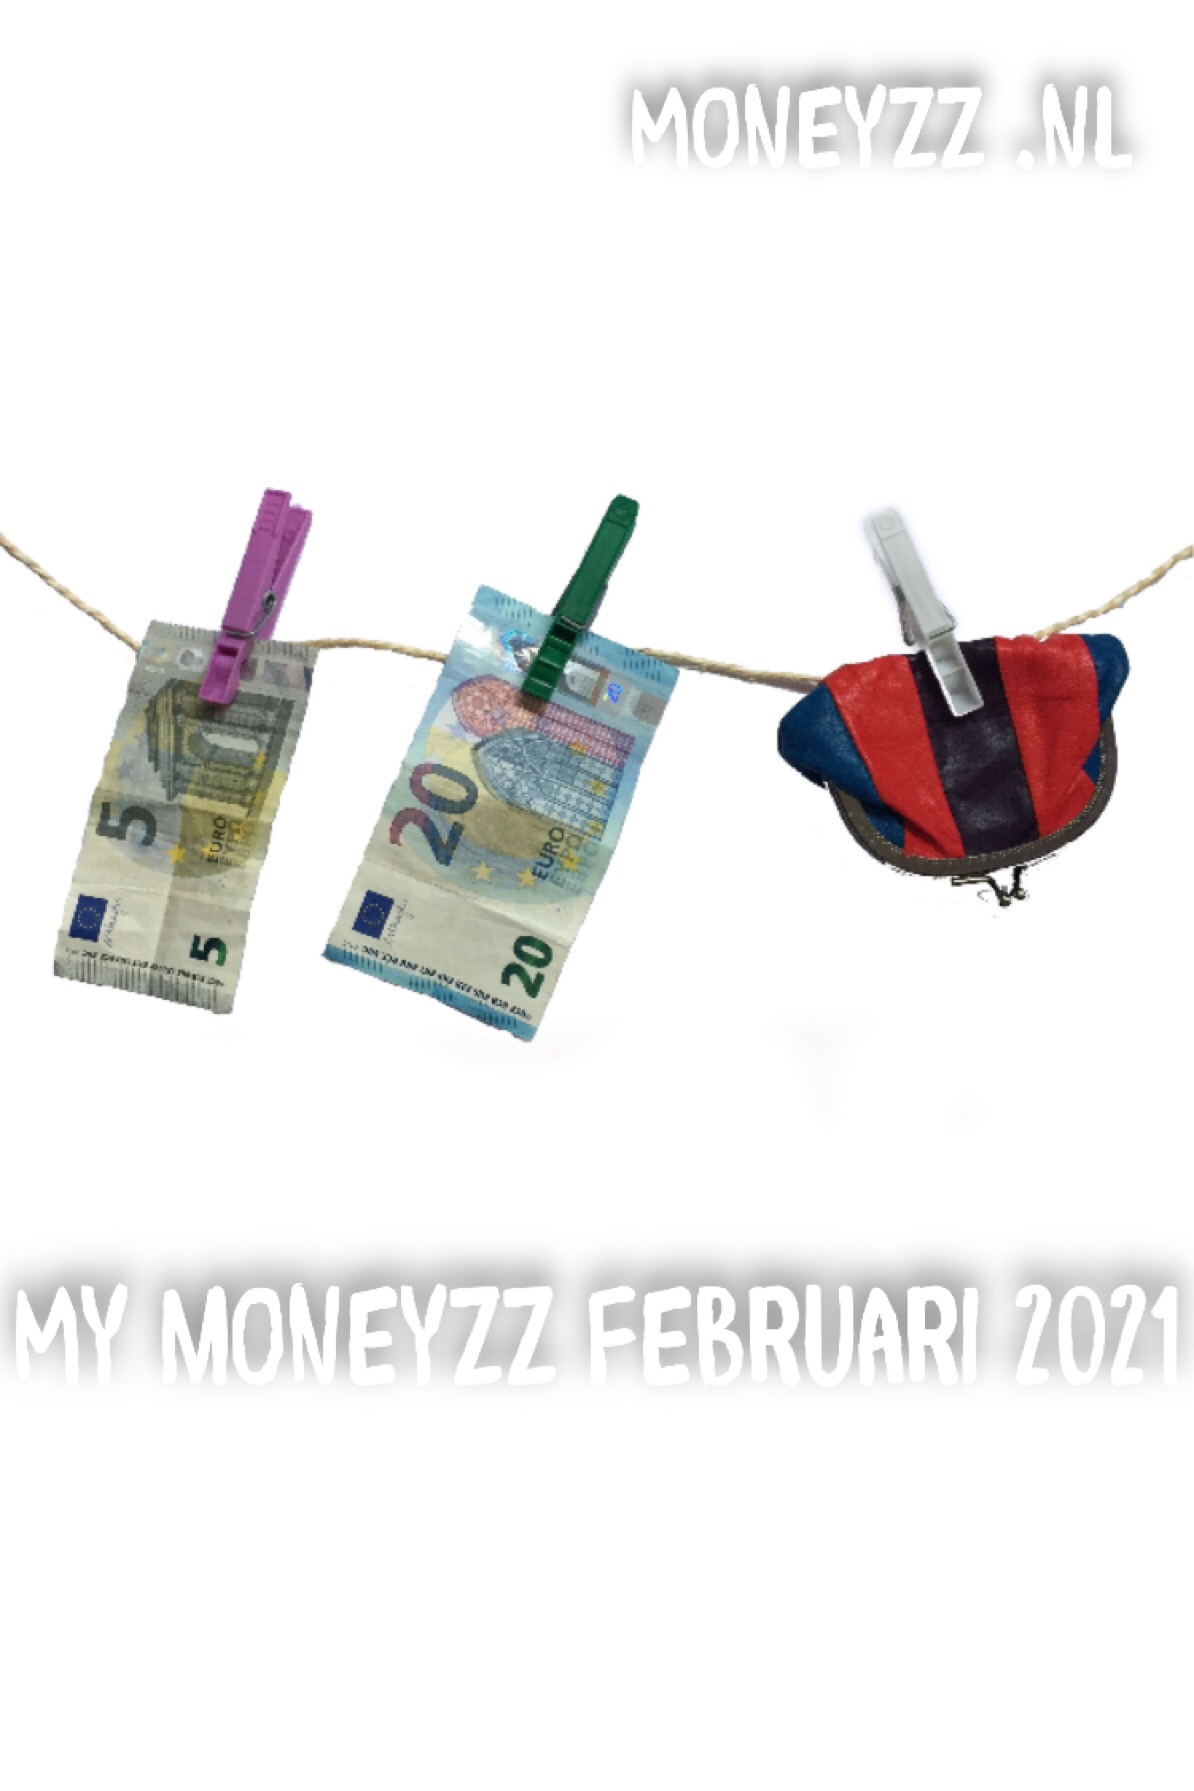 My moneyzz Februari 2021